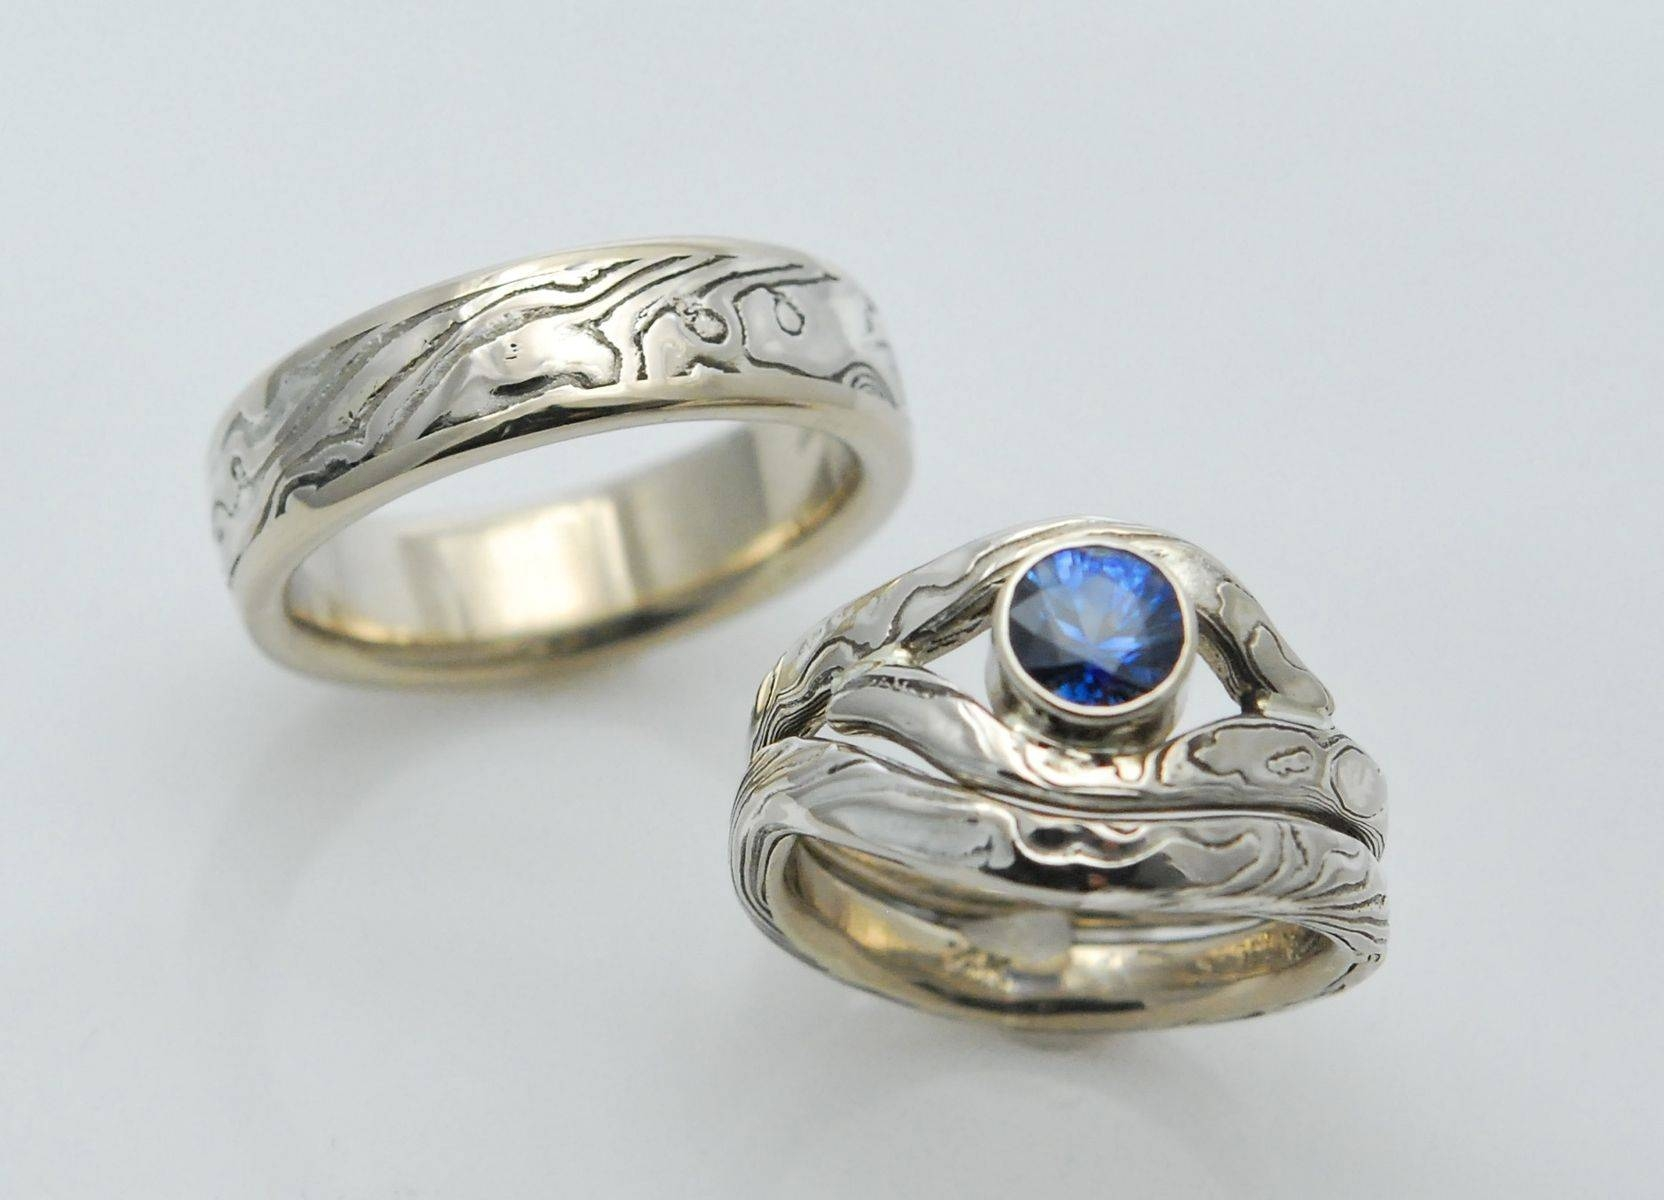 Mokume Gane Rings | Mokume Wedding Bands And Engagement Rings With Regard To Mokume Wedding Bands (View 5 of 15)